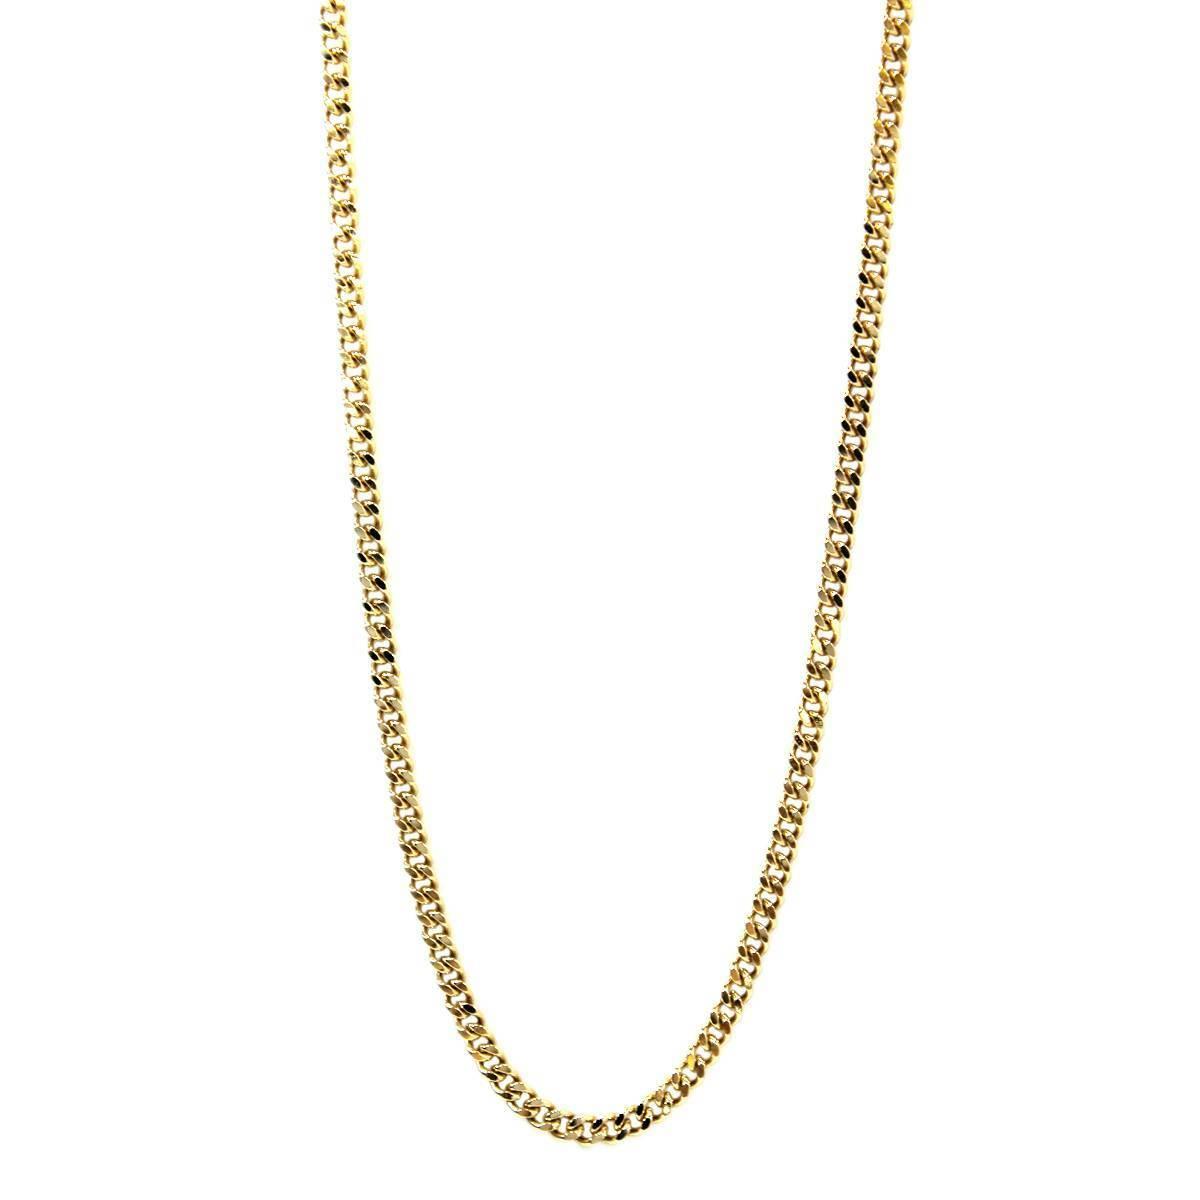 K18 18金 ゴールド 喜平 2面 ネックレス チェーン 66cm 41.3g KA 磨き仕上げ品 Aランク_画像2